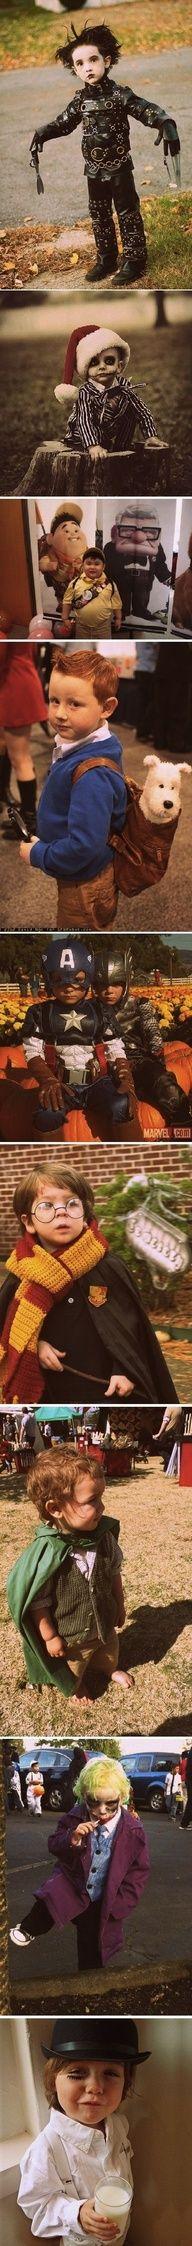 Pretty sure the Harry Potter kid is mine, at the Hobbit is @Erin B B Midgett Trindles.